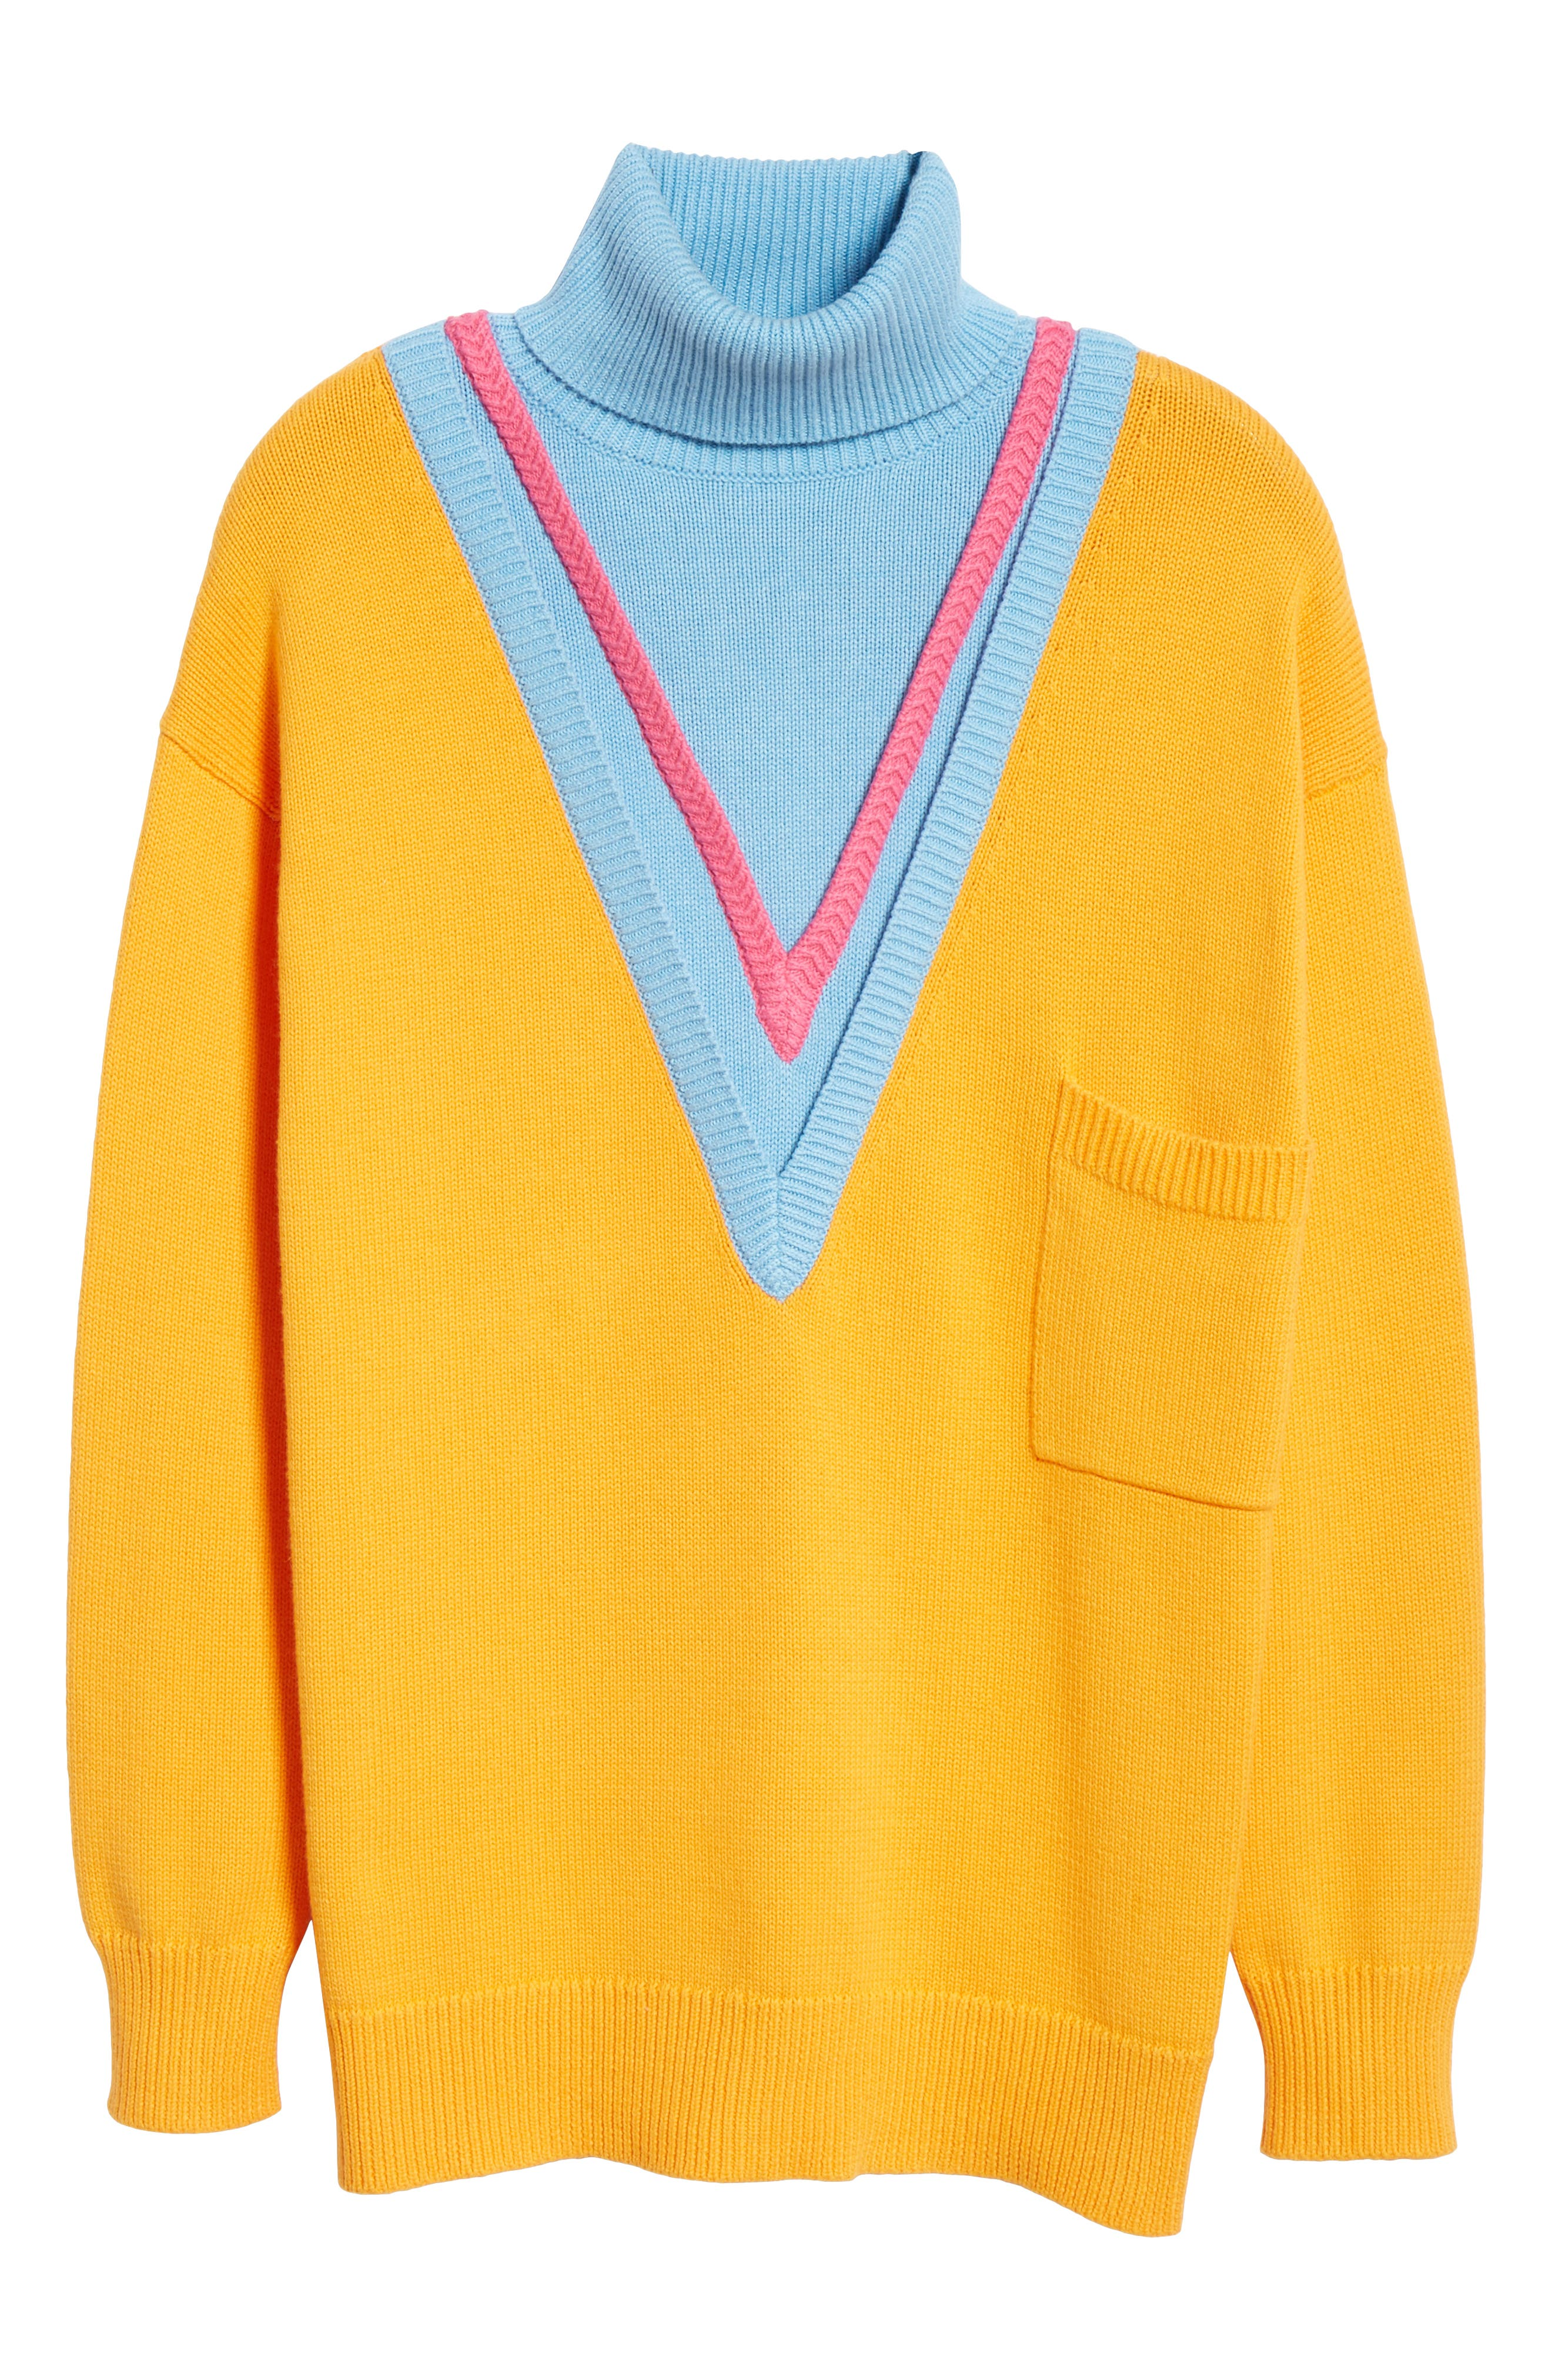 VICTOR GLEMAUD,                             Layered Cotton & Cashmere Turtleneck Sweater,                             Alternate thumbnail 6, color,                             ORANGE COMBO